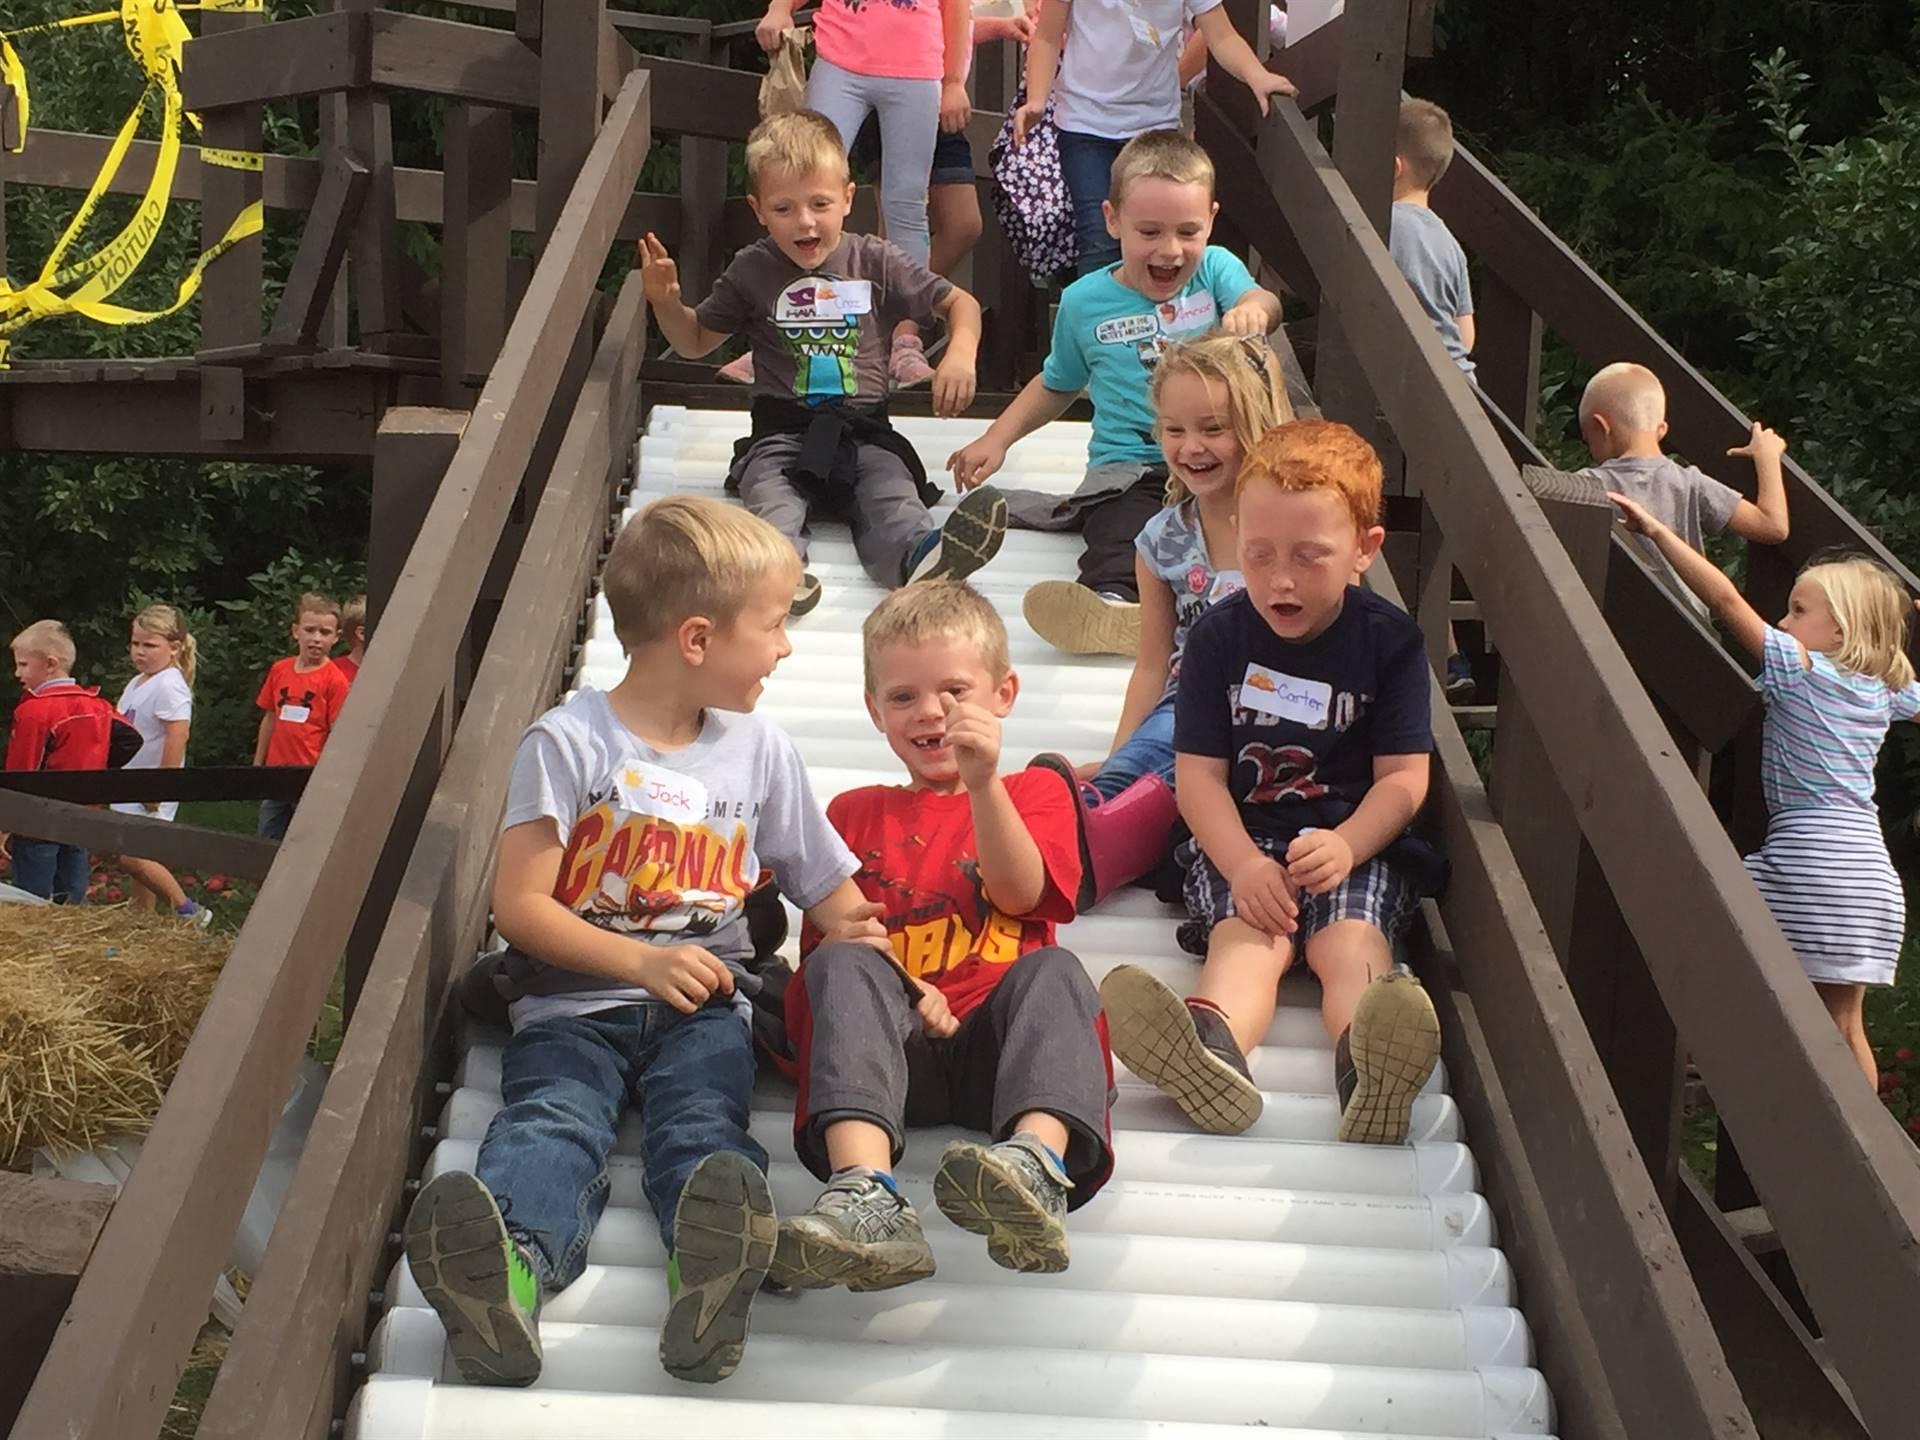 Fun day at Brumbaugh Fruit & Fun Farm!